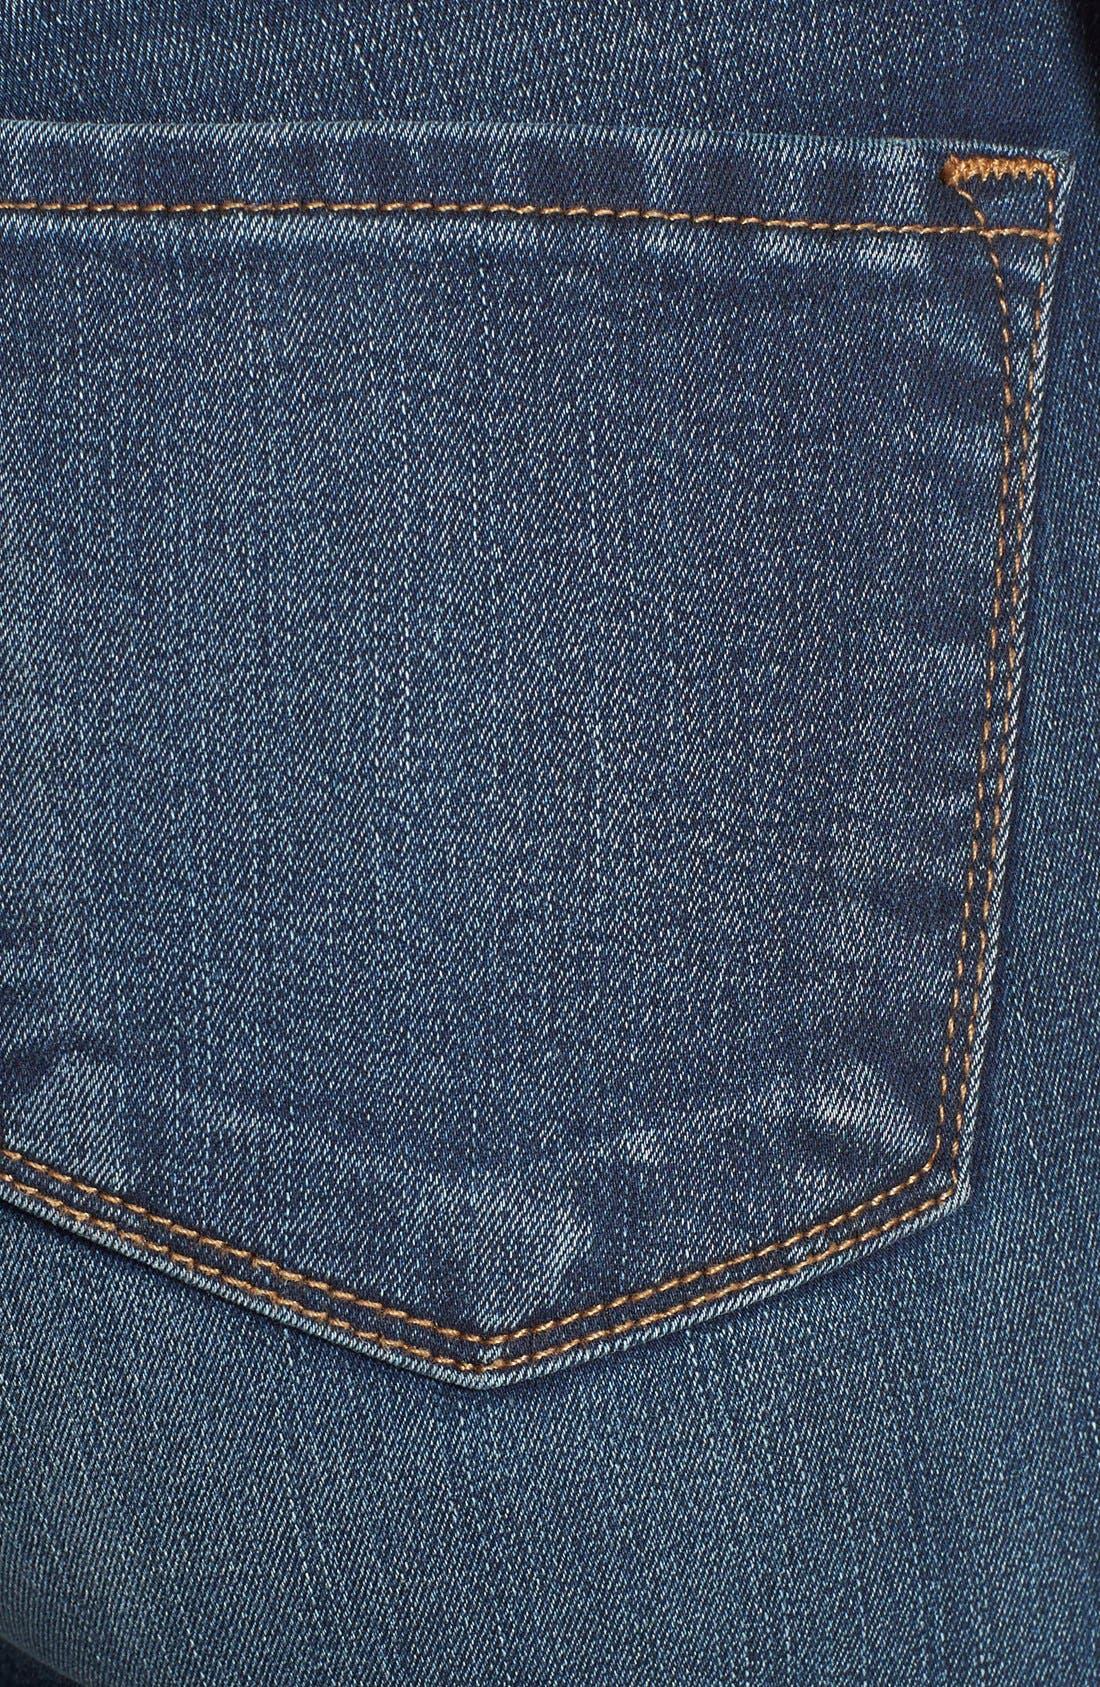 Alternate Image 3  - J Brand '8112 Mid Rise Rail' Skinny Jeans (Venture)